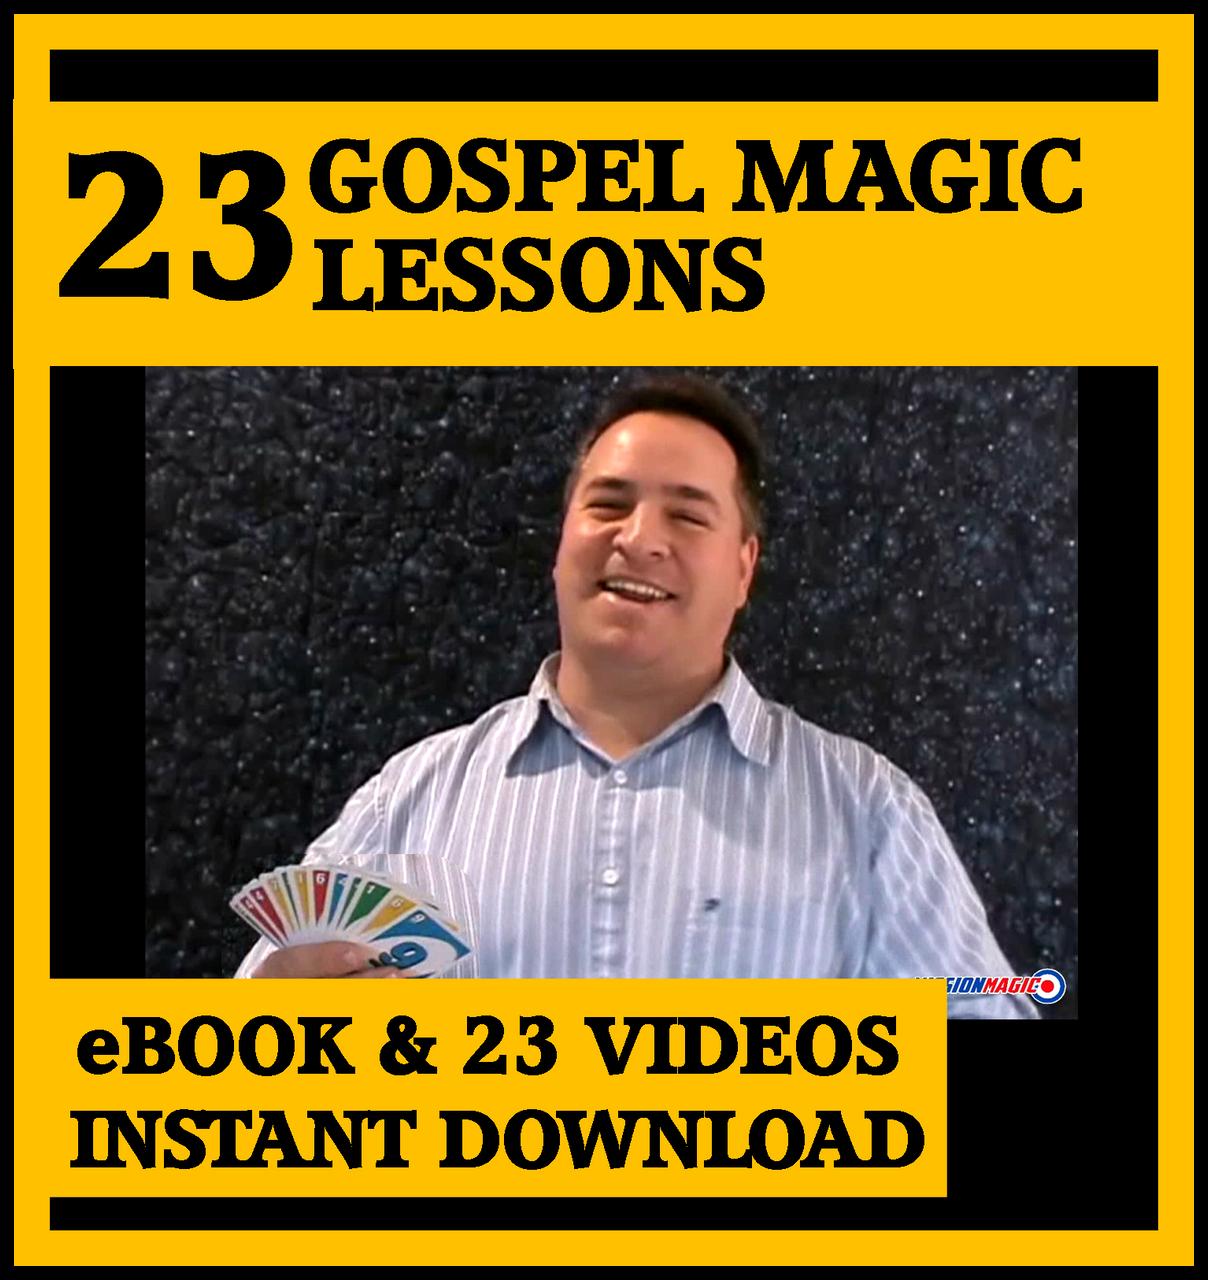 Magic for Jesus Gospel Magic Lesson Trick eBook DVD Video Kids Church Schools Jesus